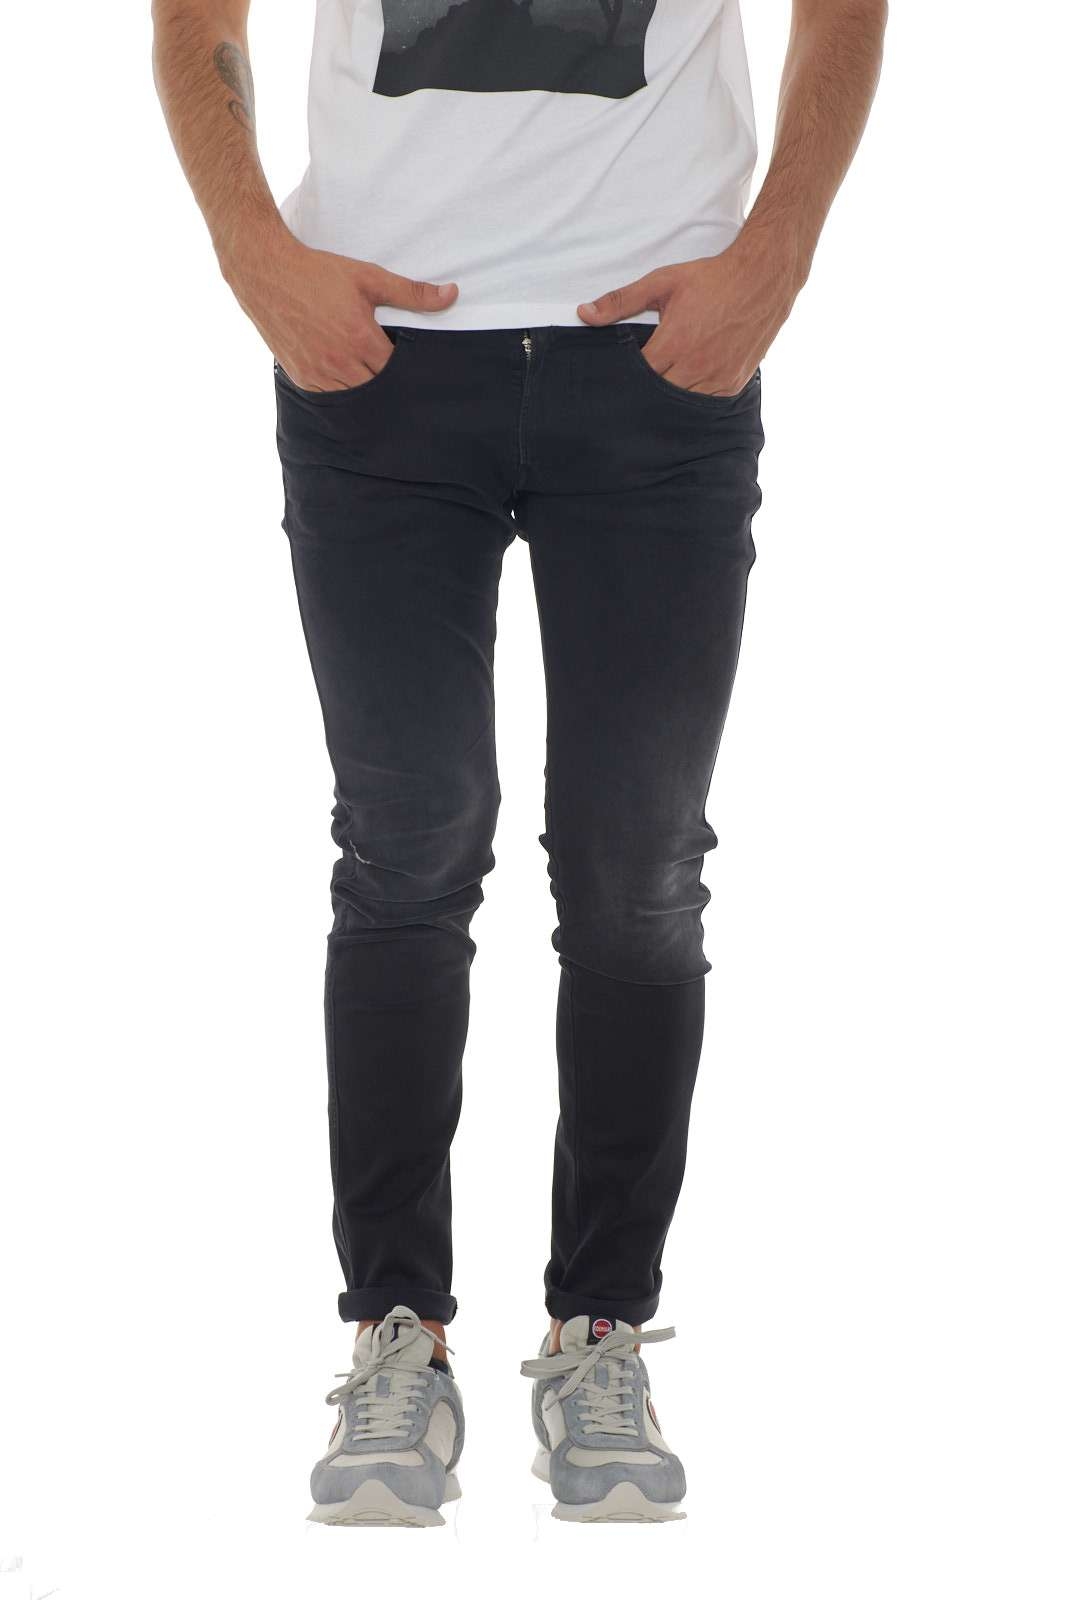 https://www.parmax.com/media/catalog/product/a/i/AI-Outlet_Parmax-Pantalone-Uomo-Replay-M91400066106B-A.jpg